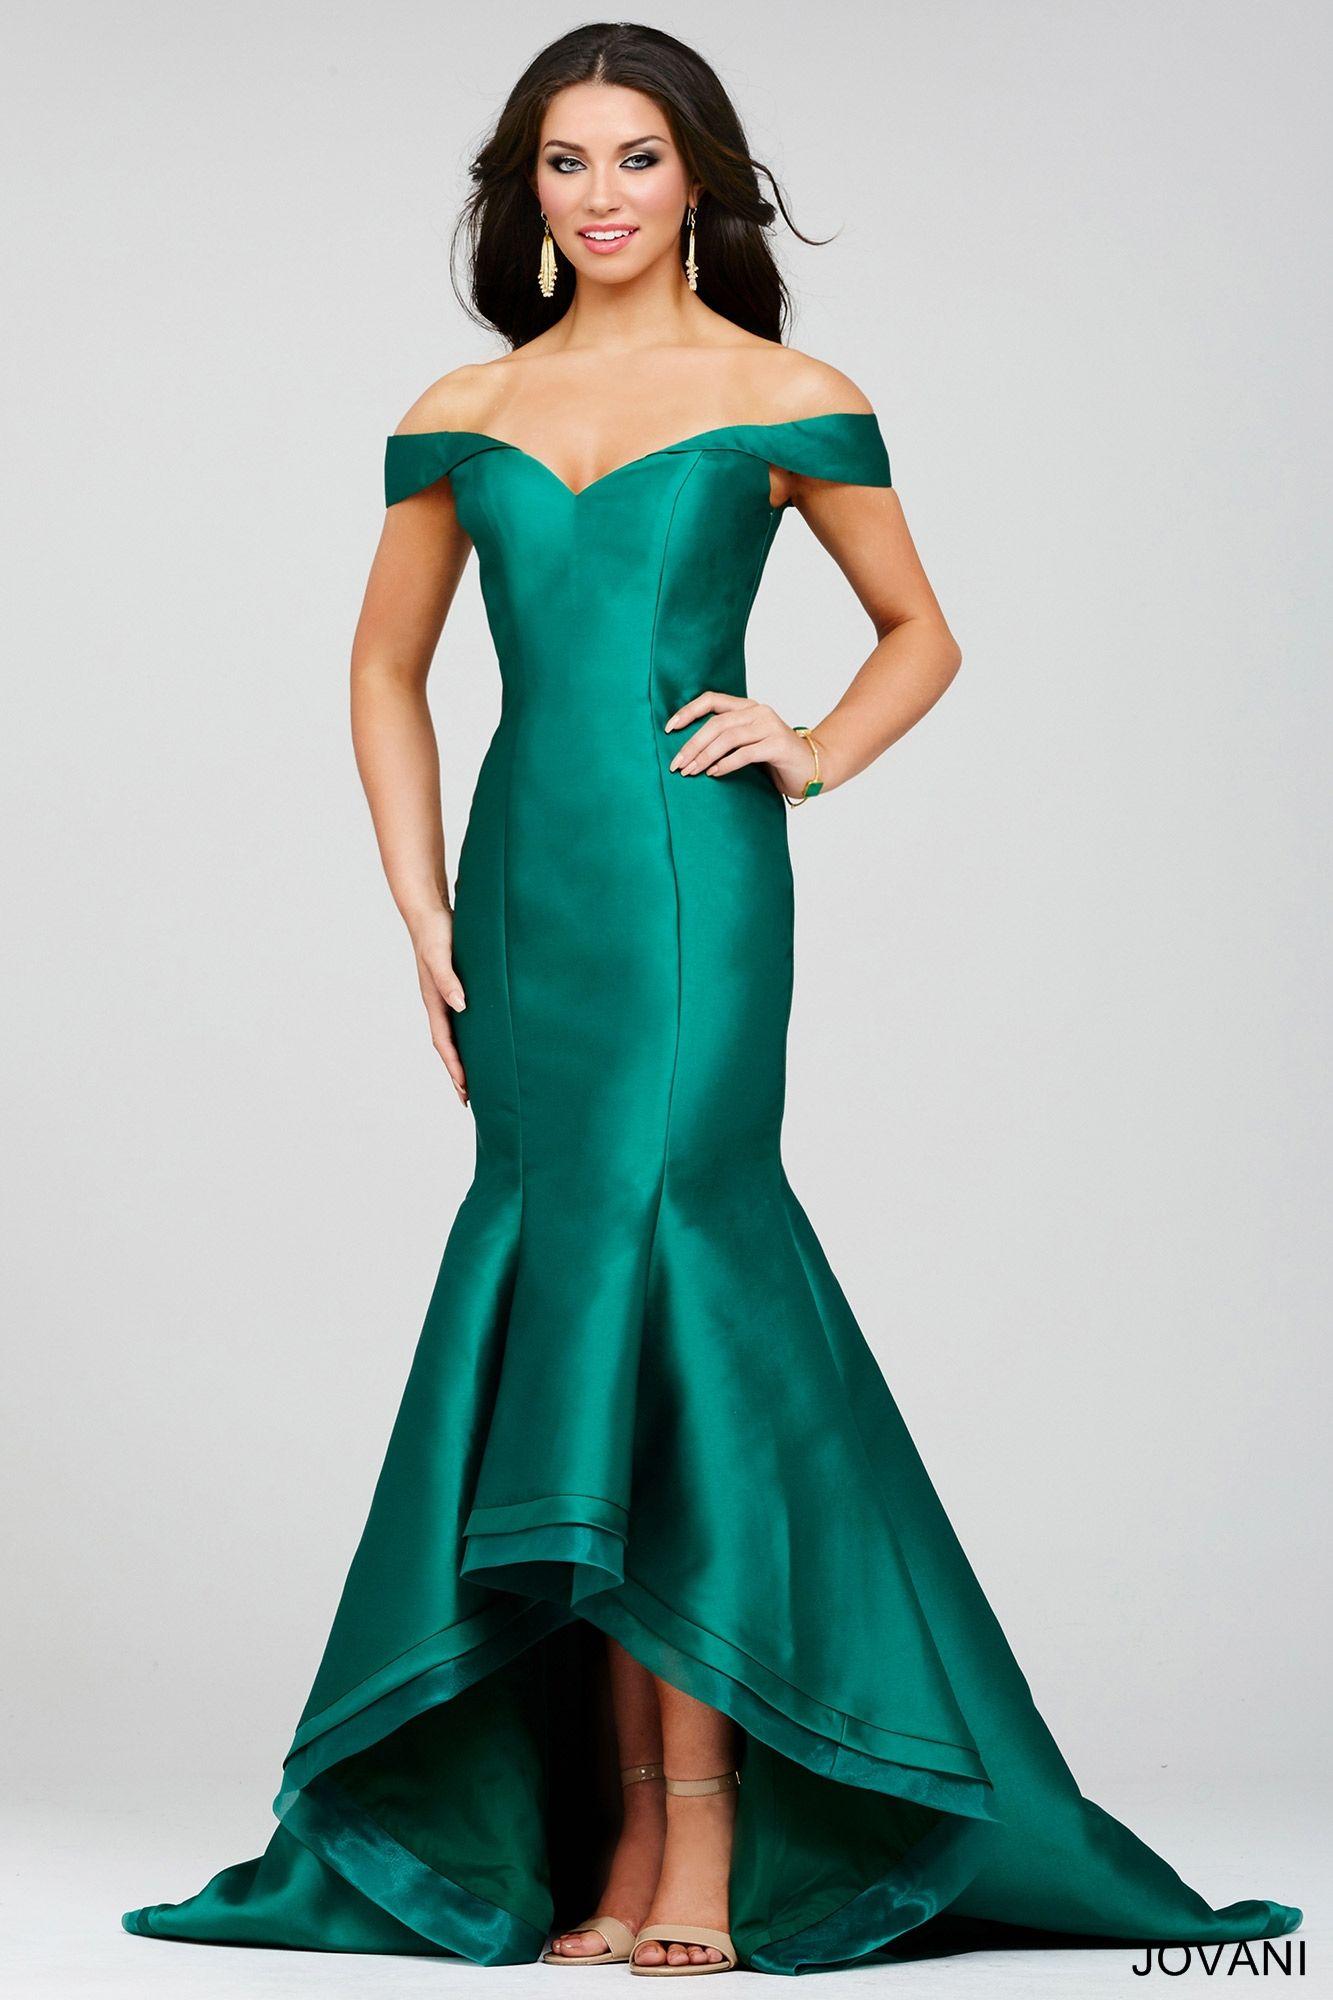 Green Satin Dress 32414 | Beau and Deb | Pinterest | Green satin ...